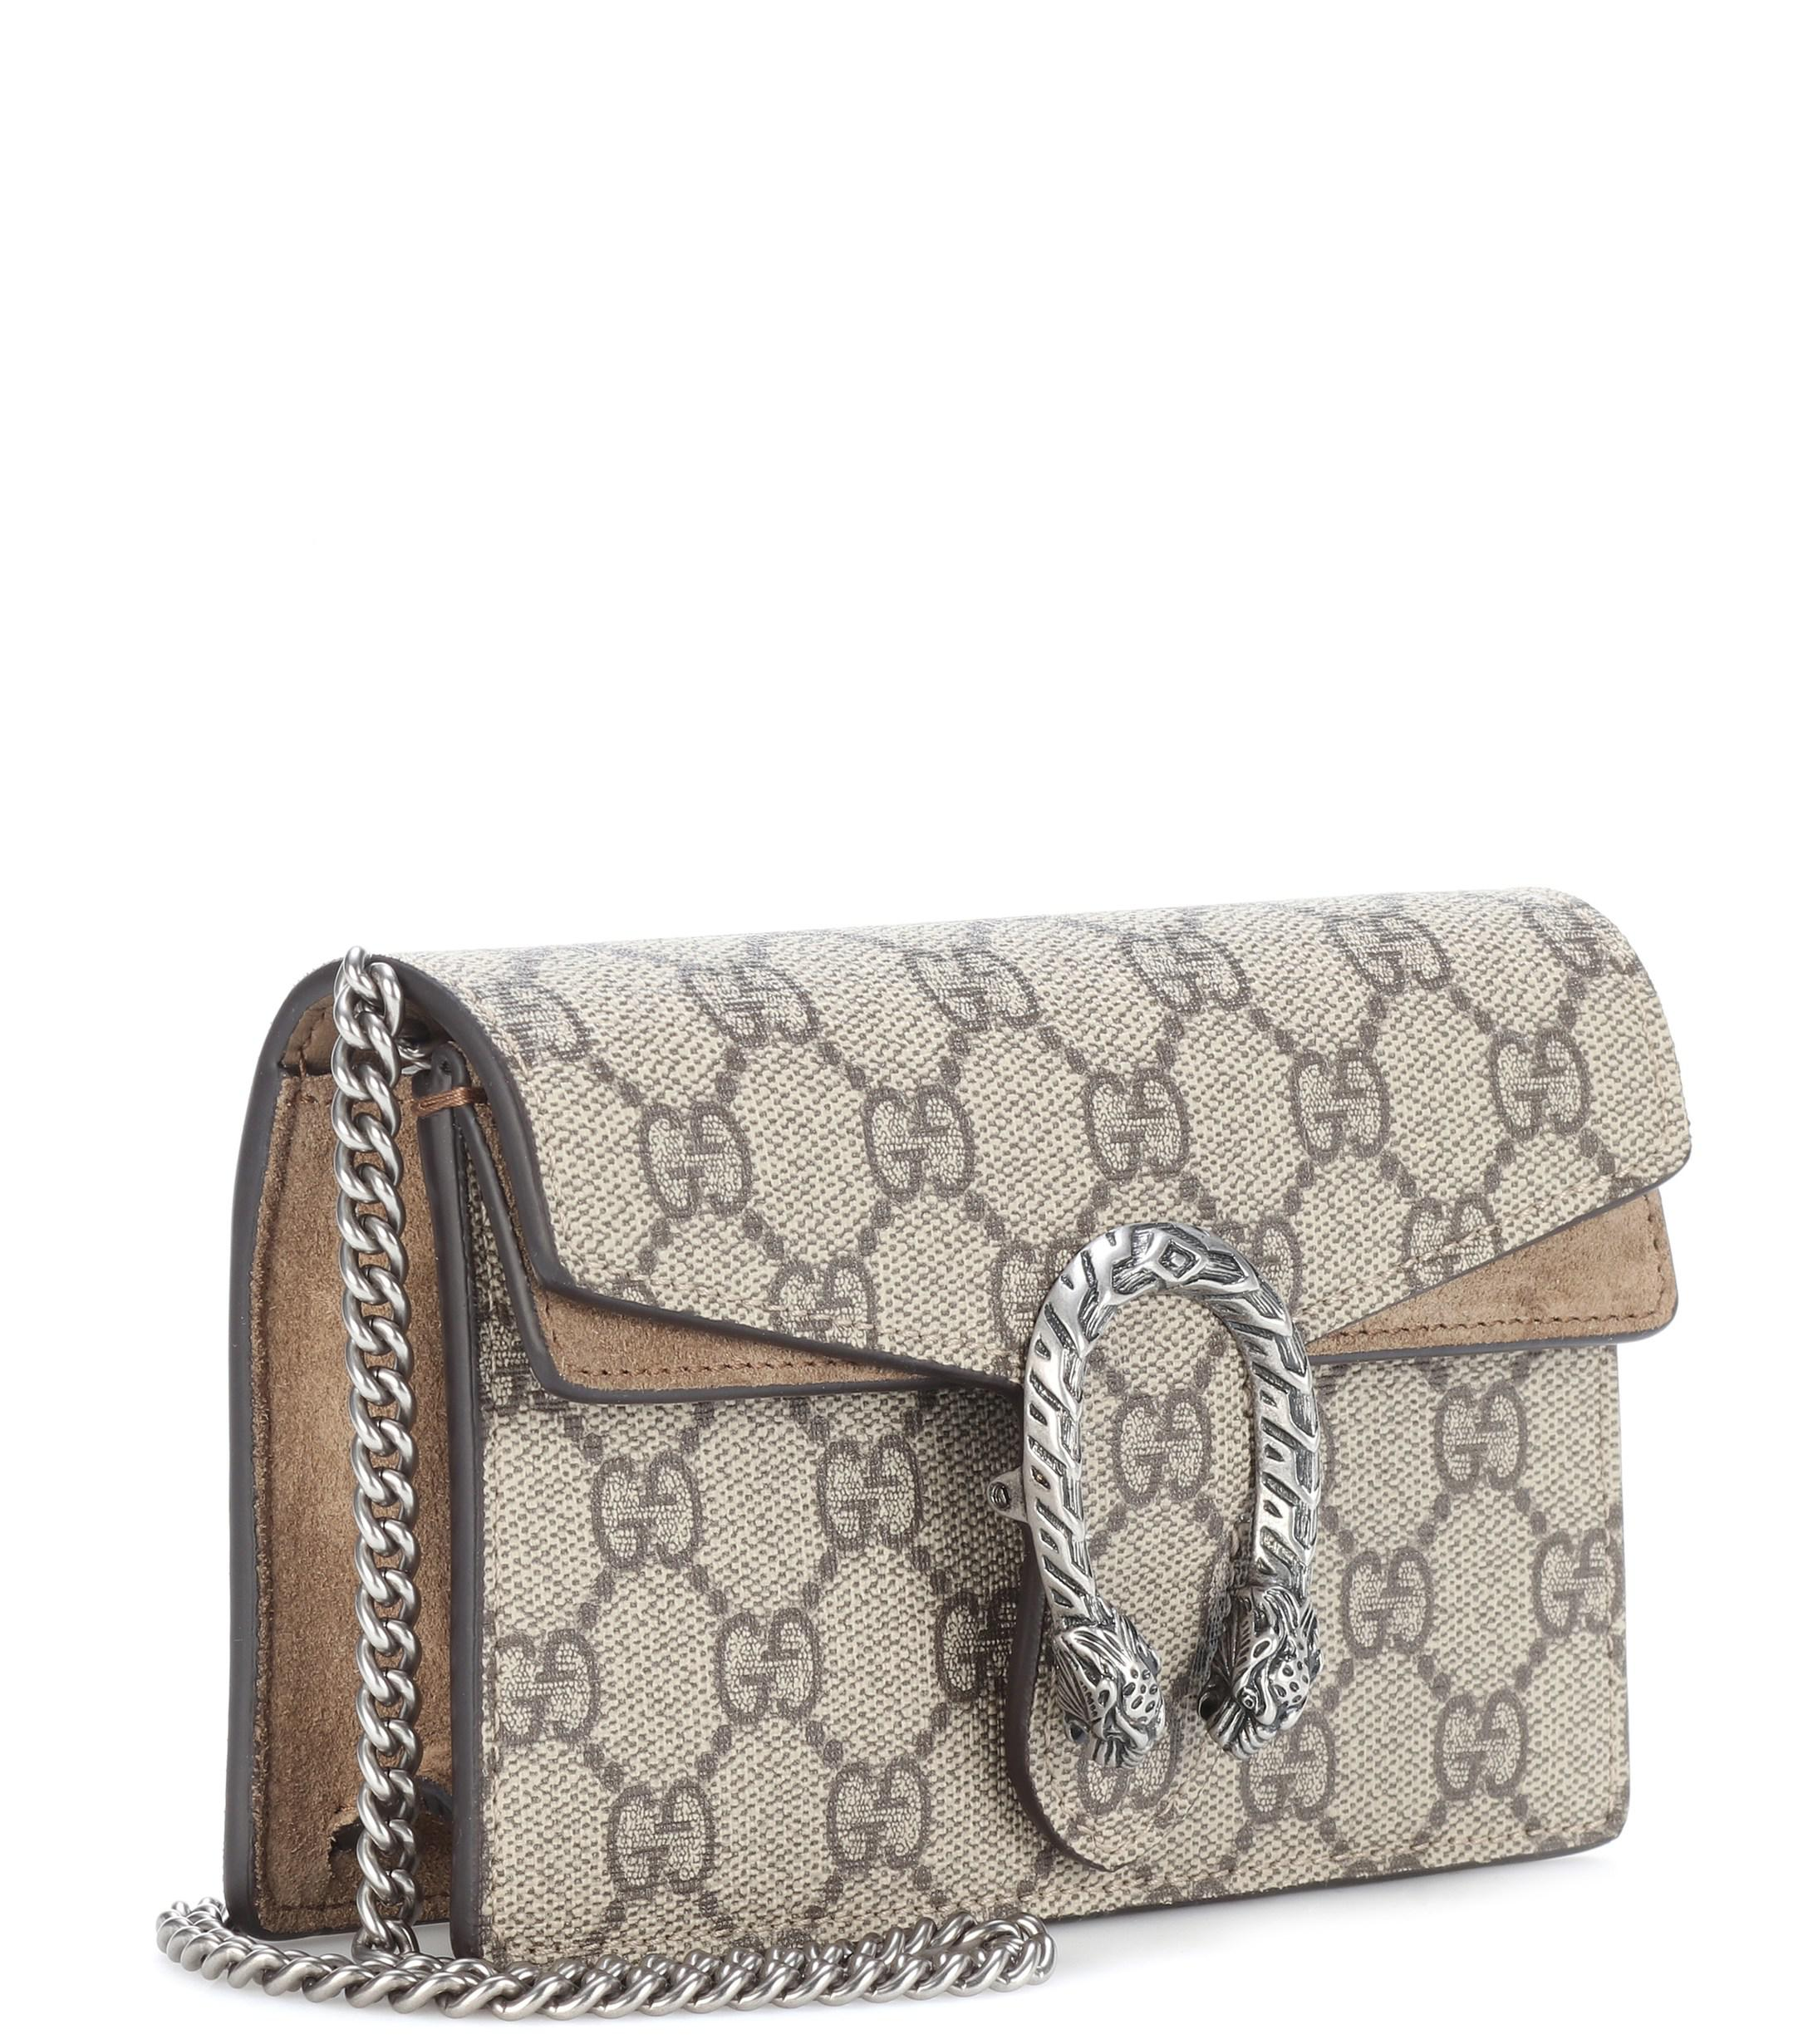 c2935bfc56 Gucci - Natural Dionysus GG Supreme Super Mini Shoulder Bag - Lyst. View  fullscreen